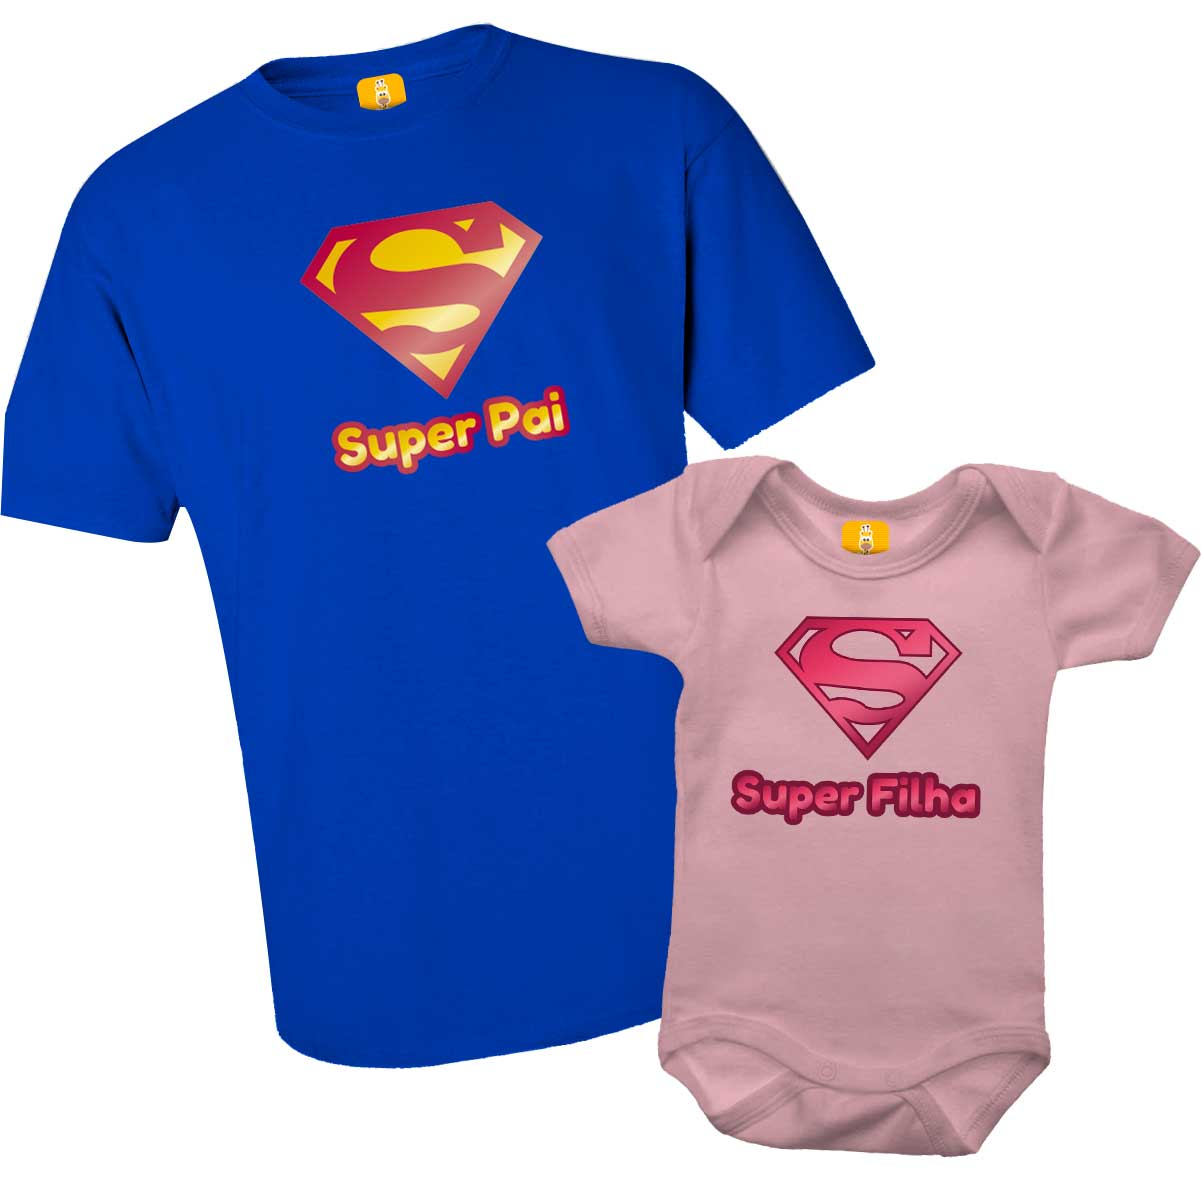 Kit camiseta e body - Super Pai e Super Filho (a)